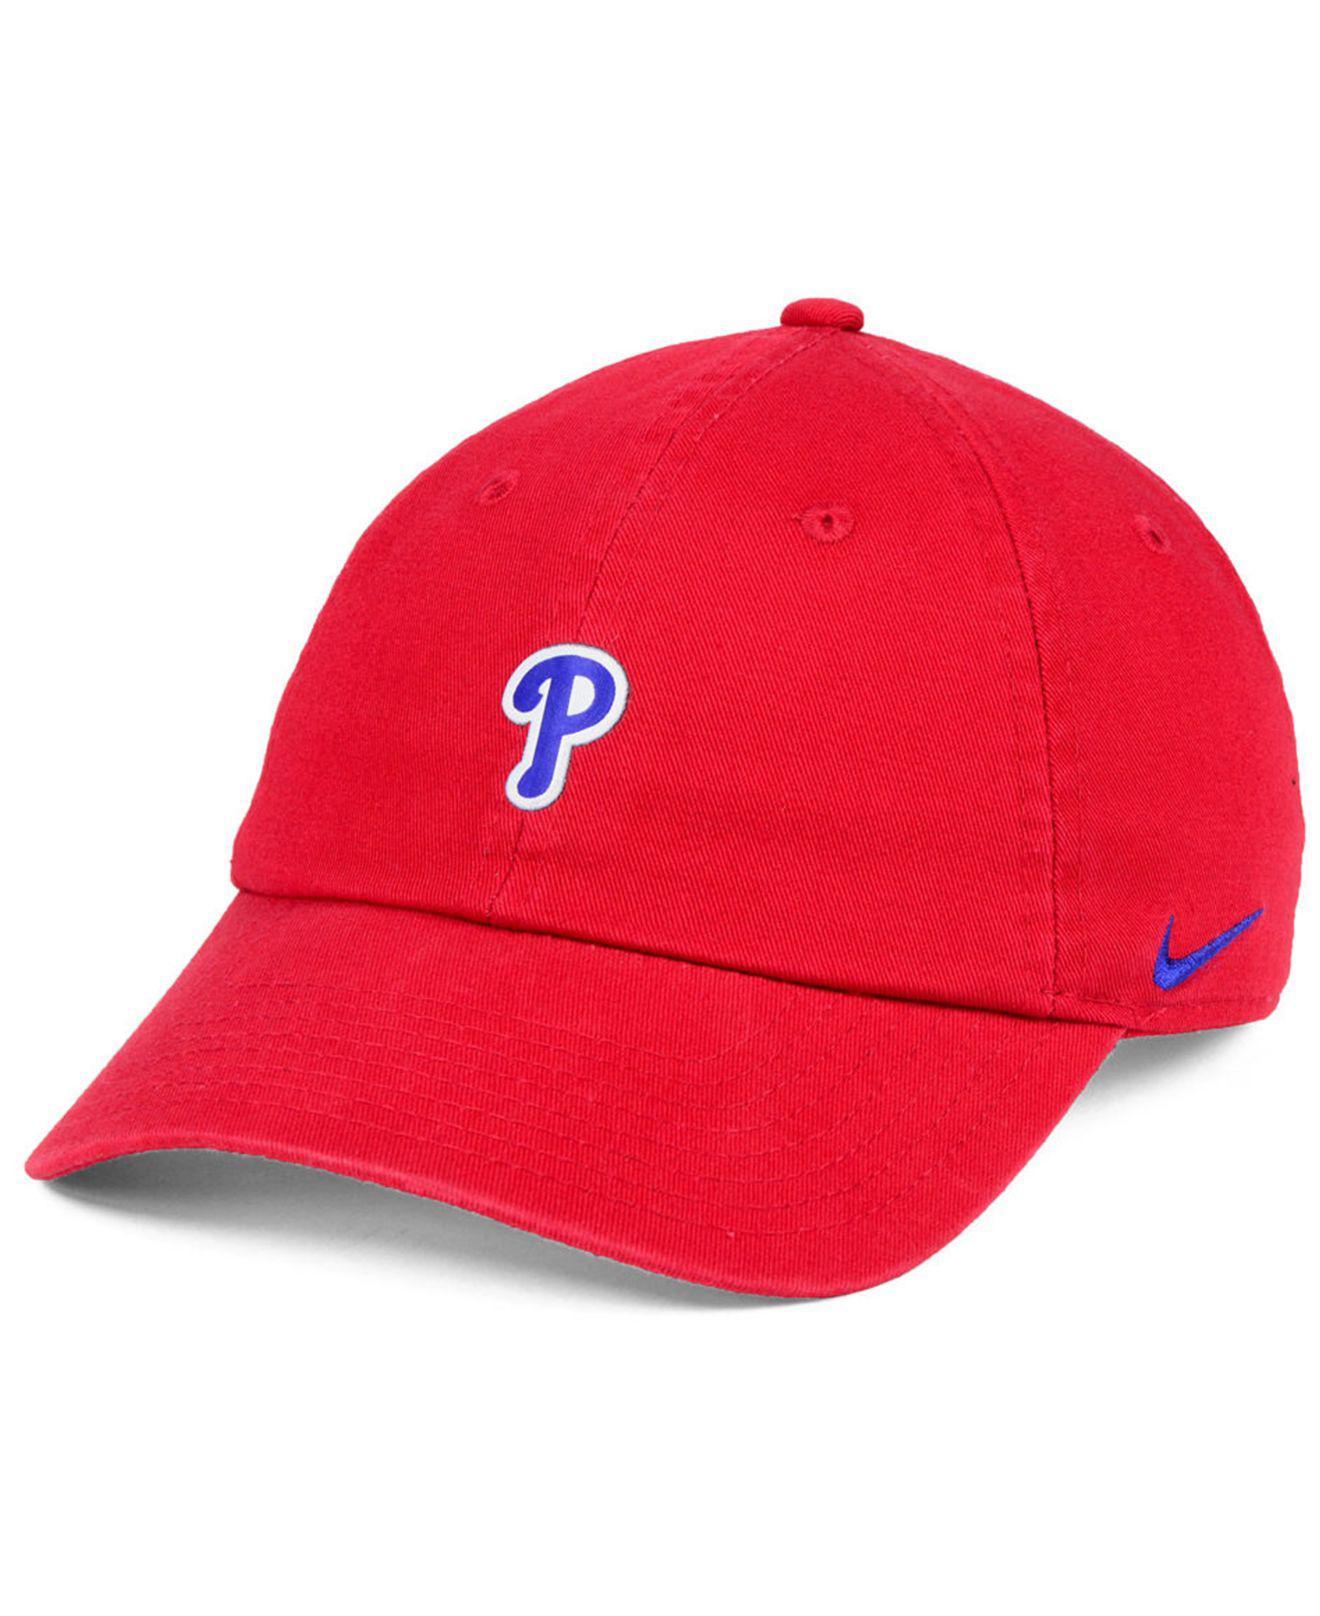 2d5f1d72391 Lyst - Nike Philadelphia Phillies Micro Cap in Red for Men